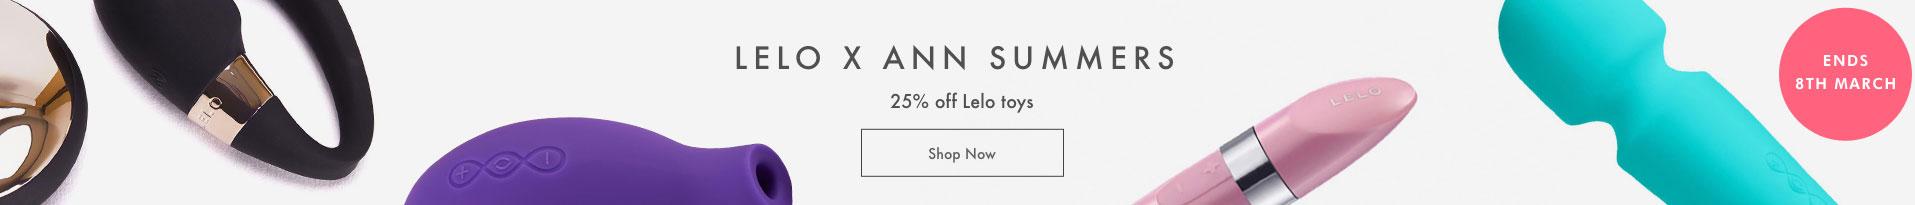 Lelo x Ann Summers - 25% off Lelo toys - Shop Now